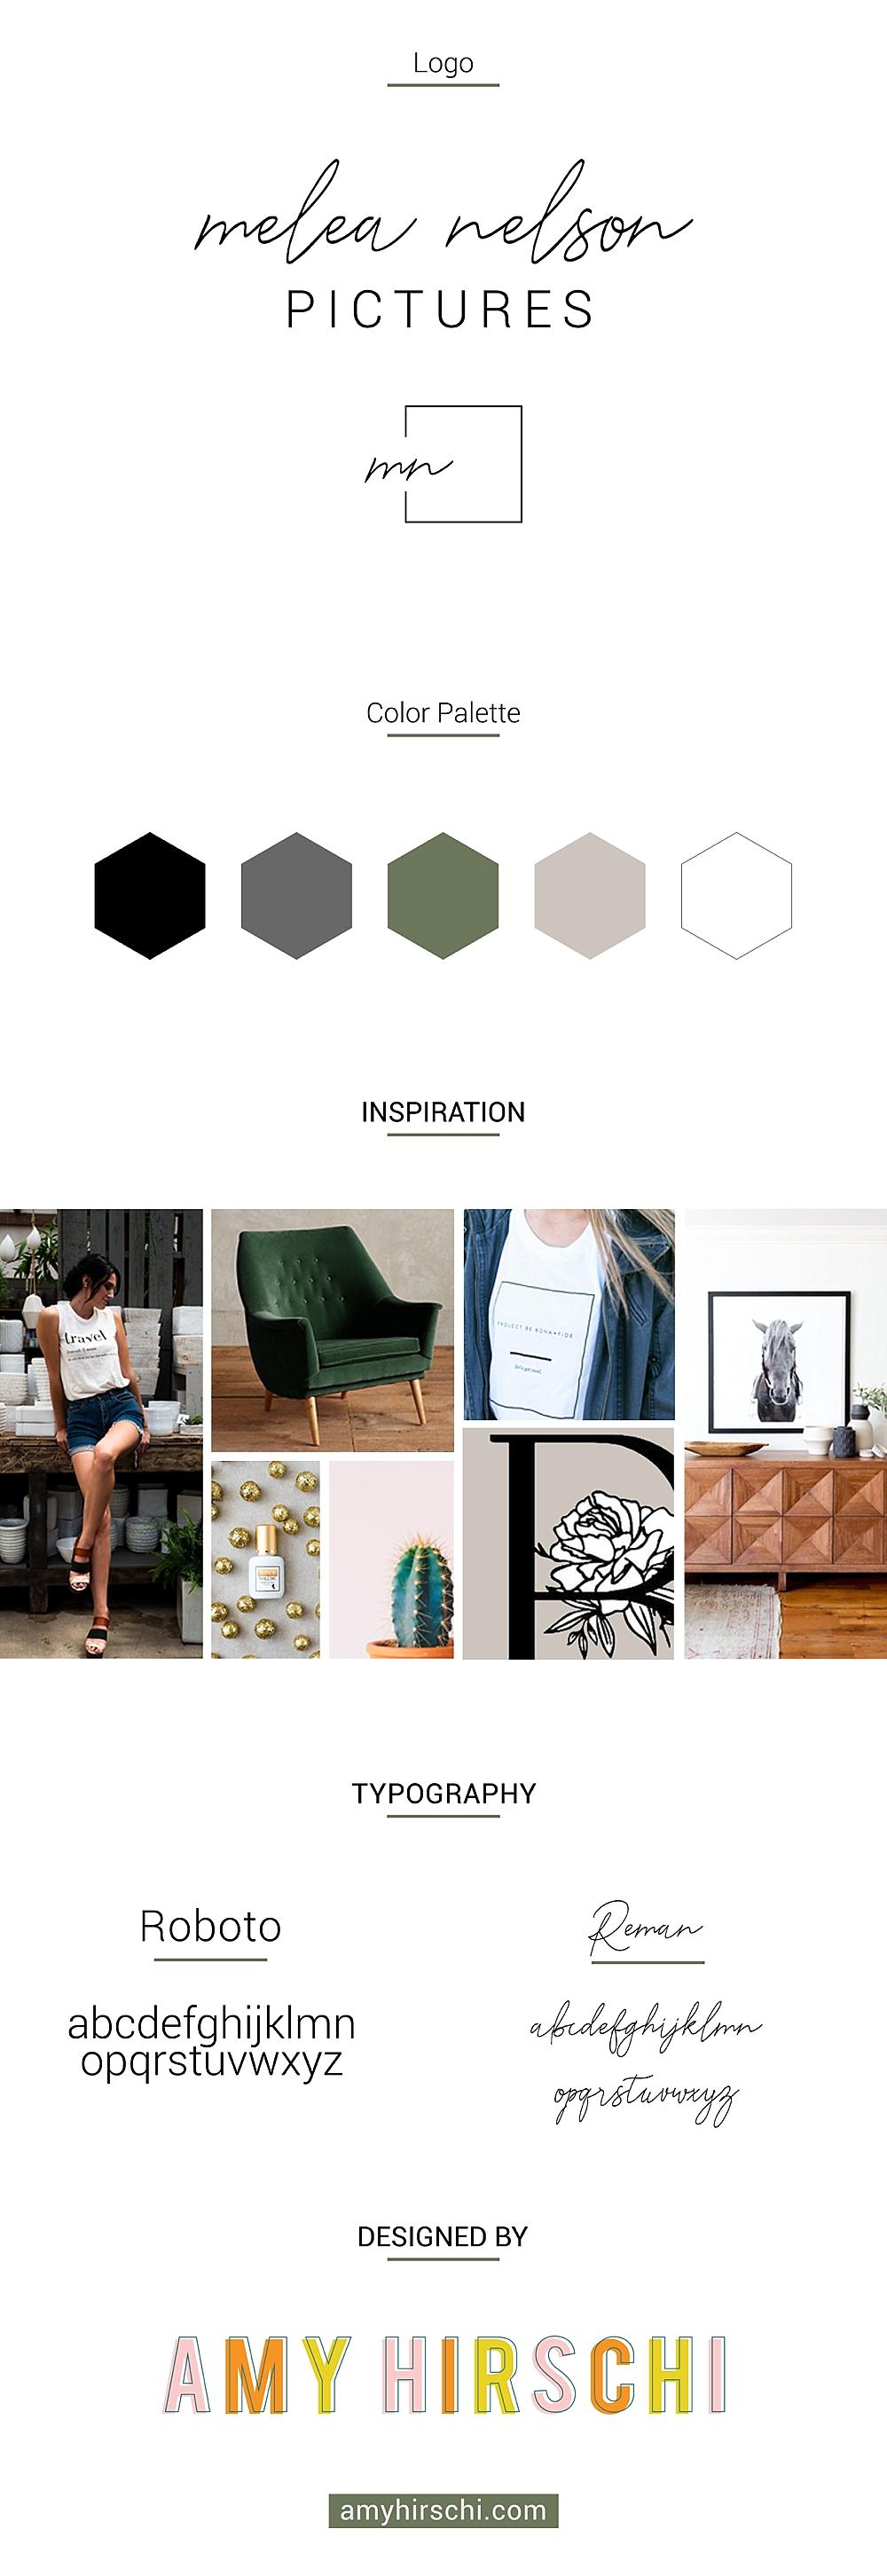 melea_logo2_Amy Hirschi Creative_brand designer_Melea Nelson Pictures_utah photographer_Logo design_photographer branding.jpg